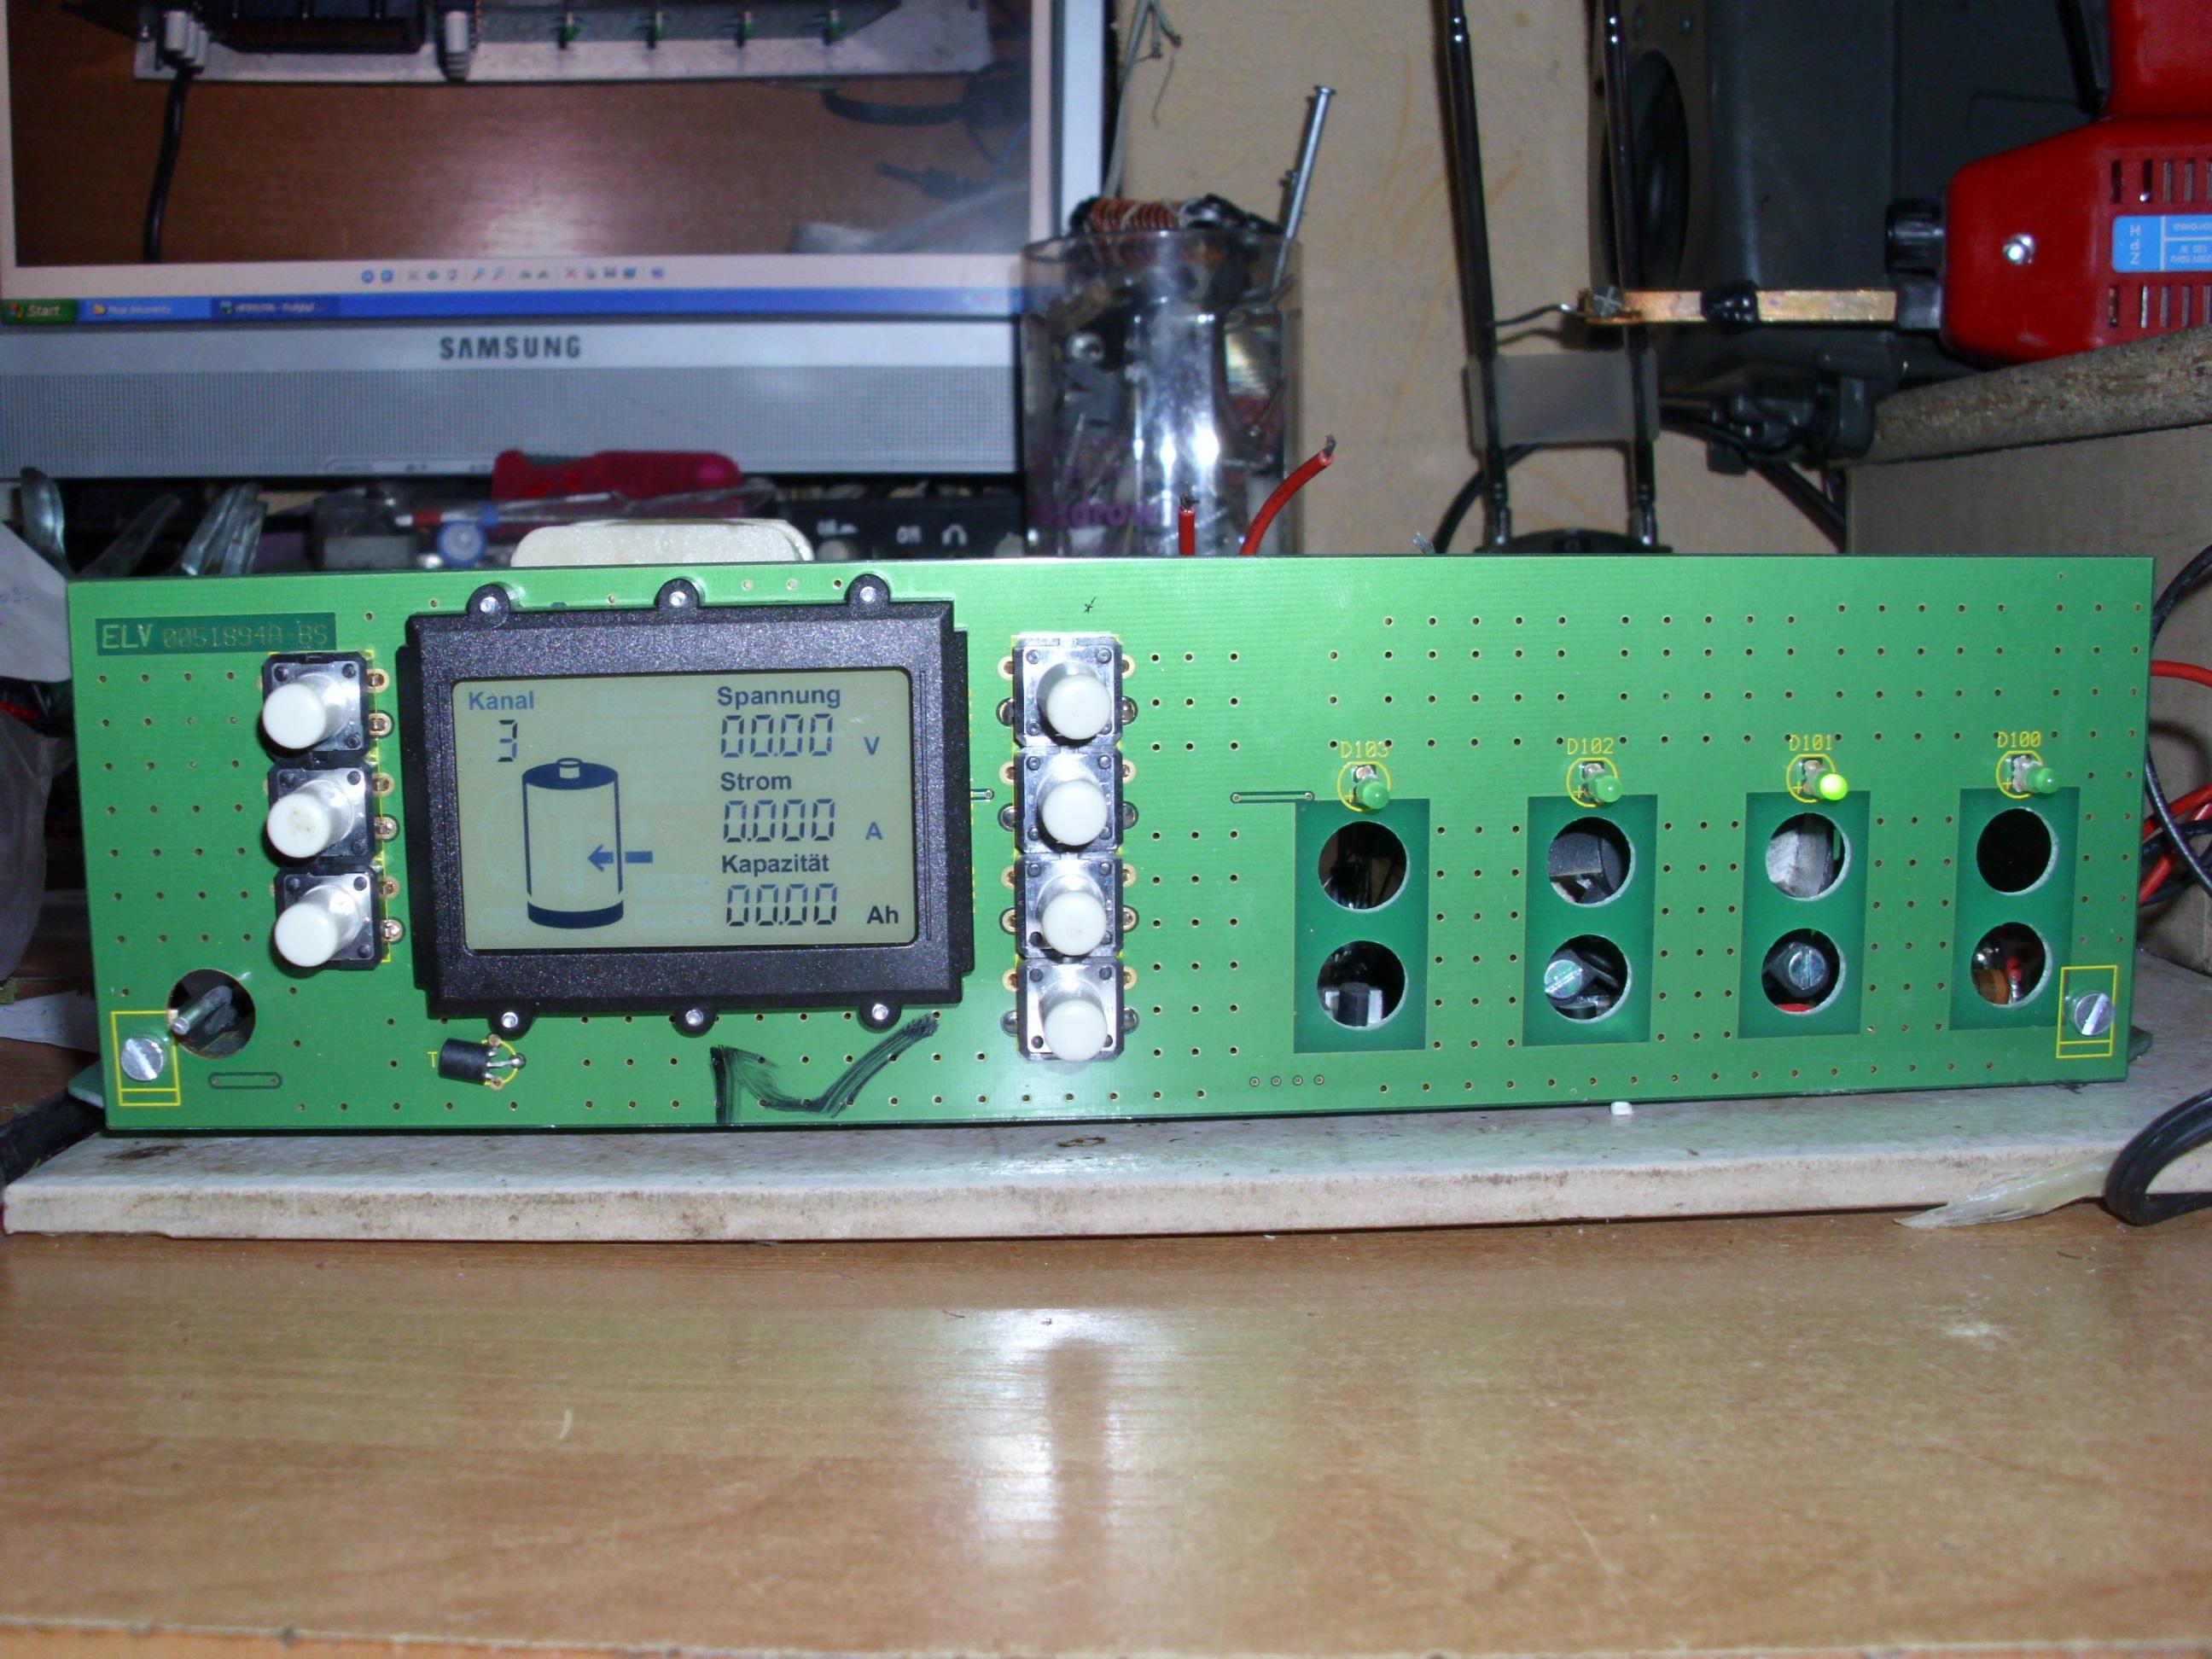 [Sprzedam] ALC7000 Expert - niekompletne